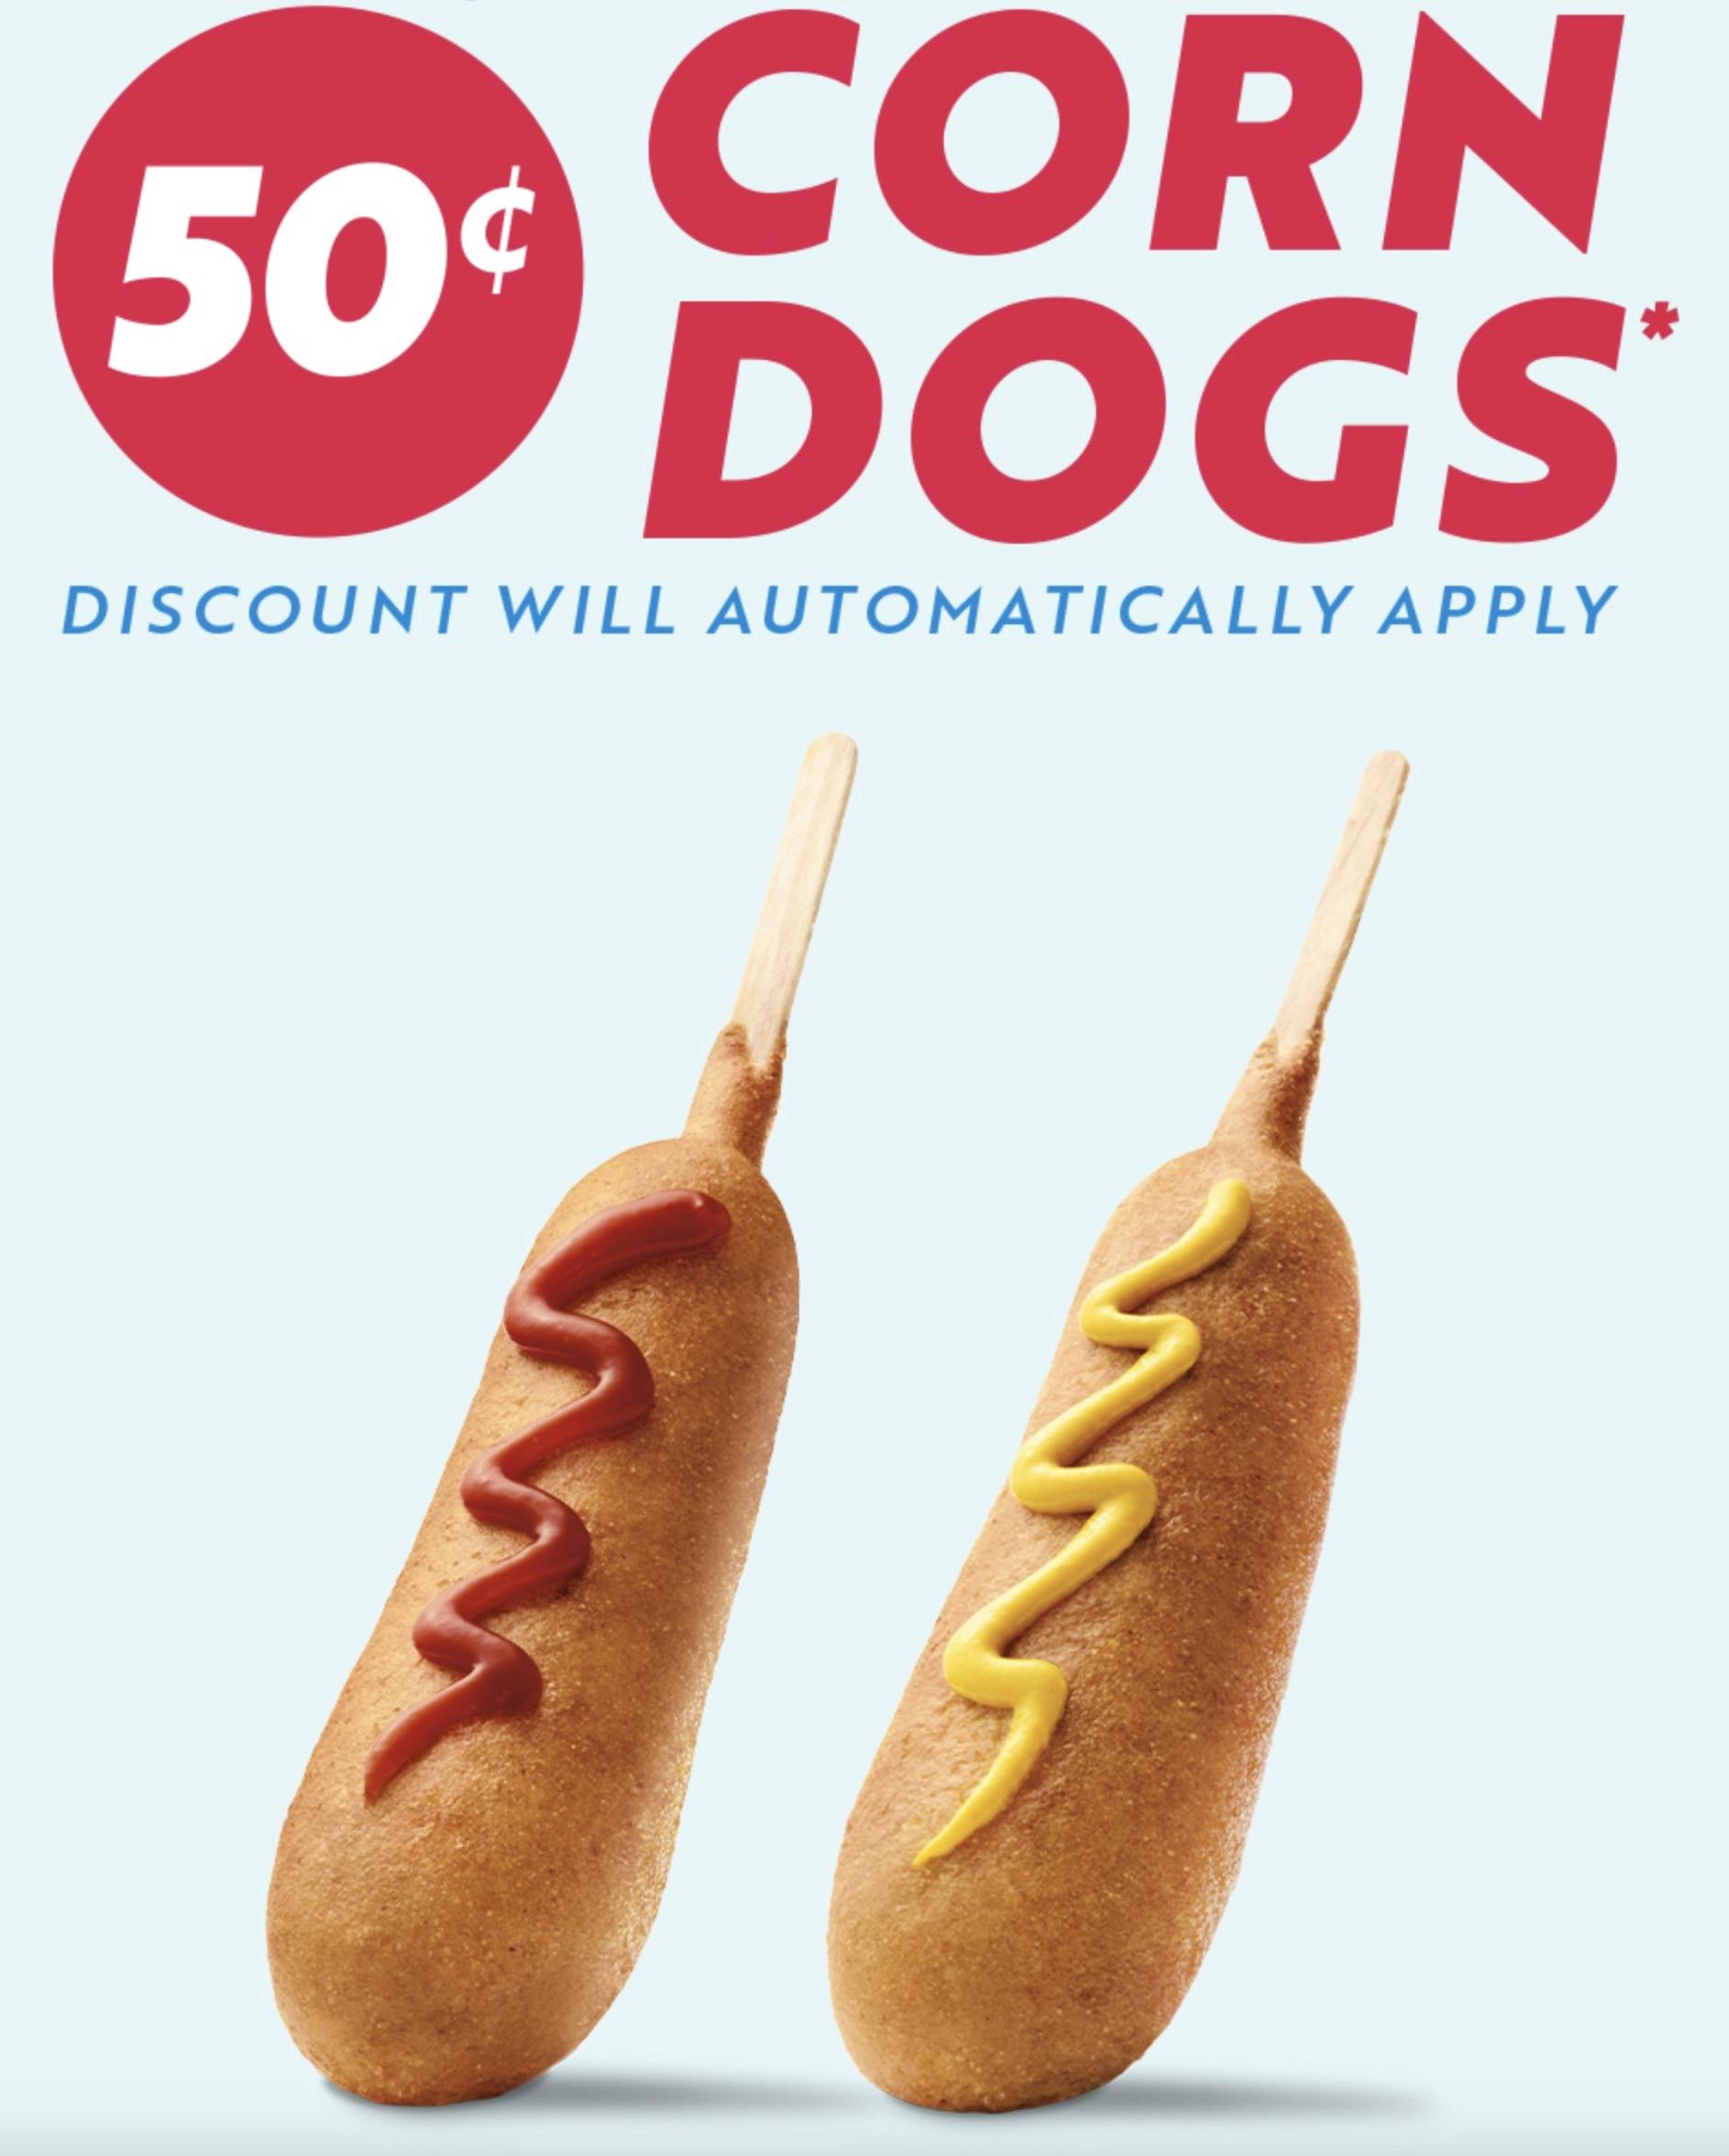 sonic corn dogs 50 2020